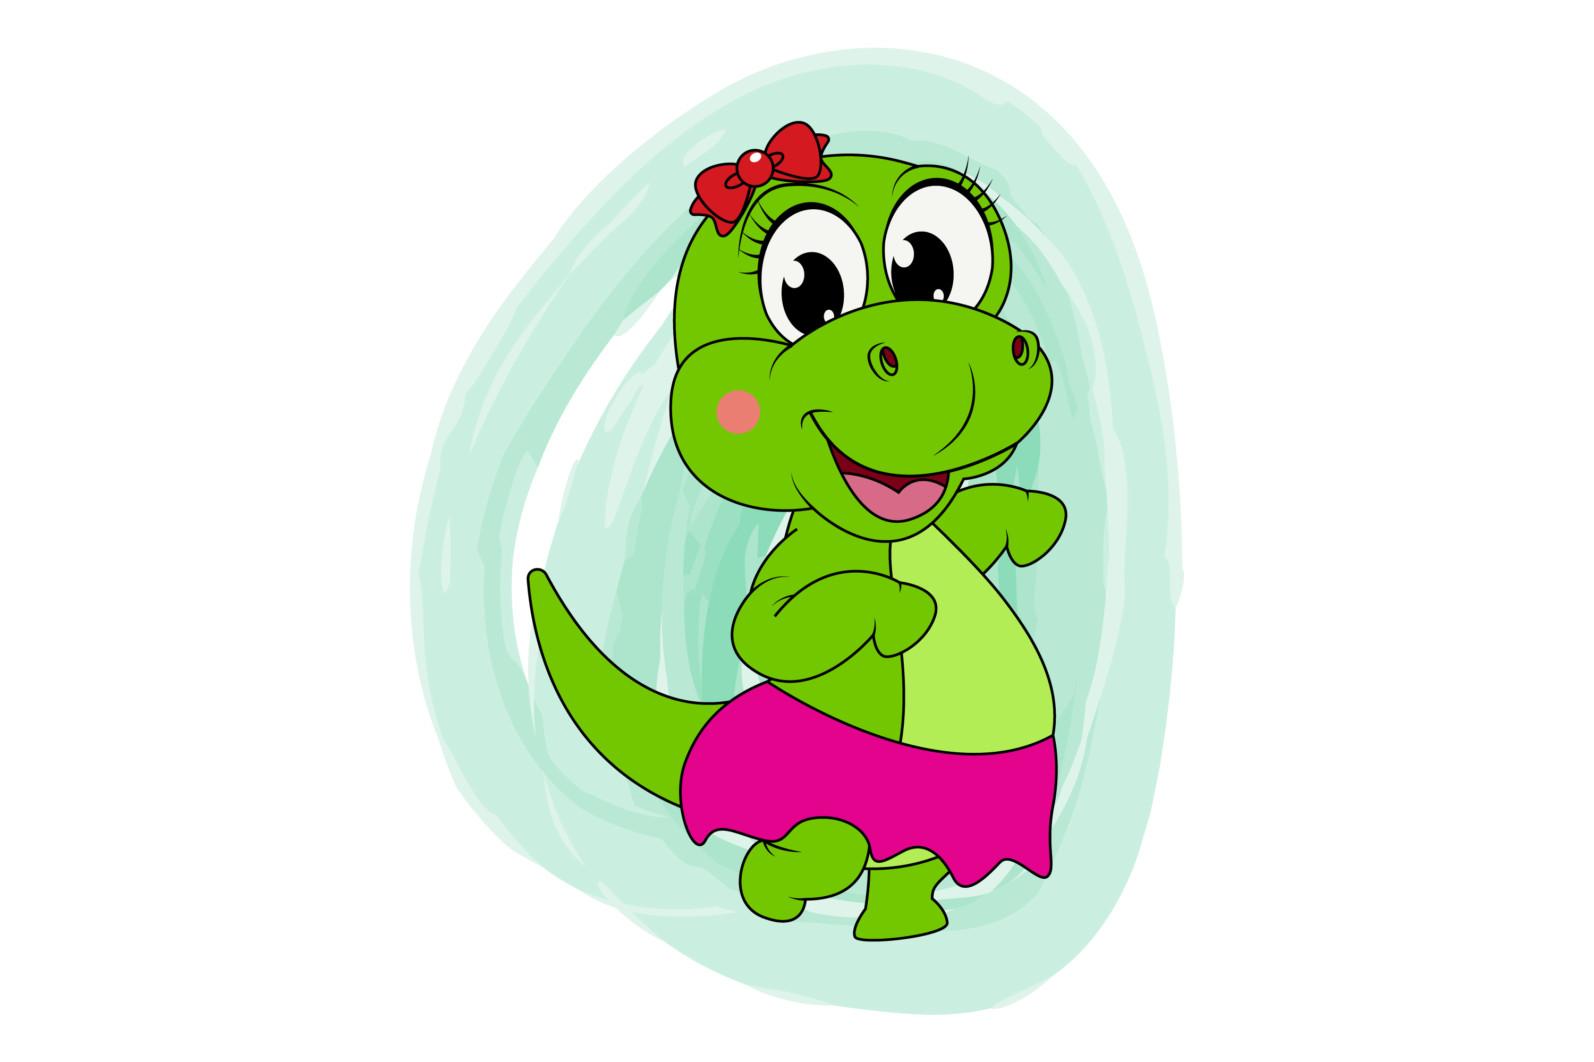 preety dinosaur animal cartoon illustration - dinosaur3 scaled -